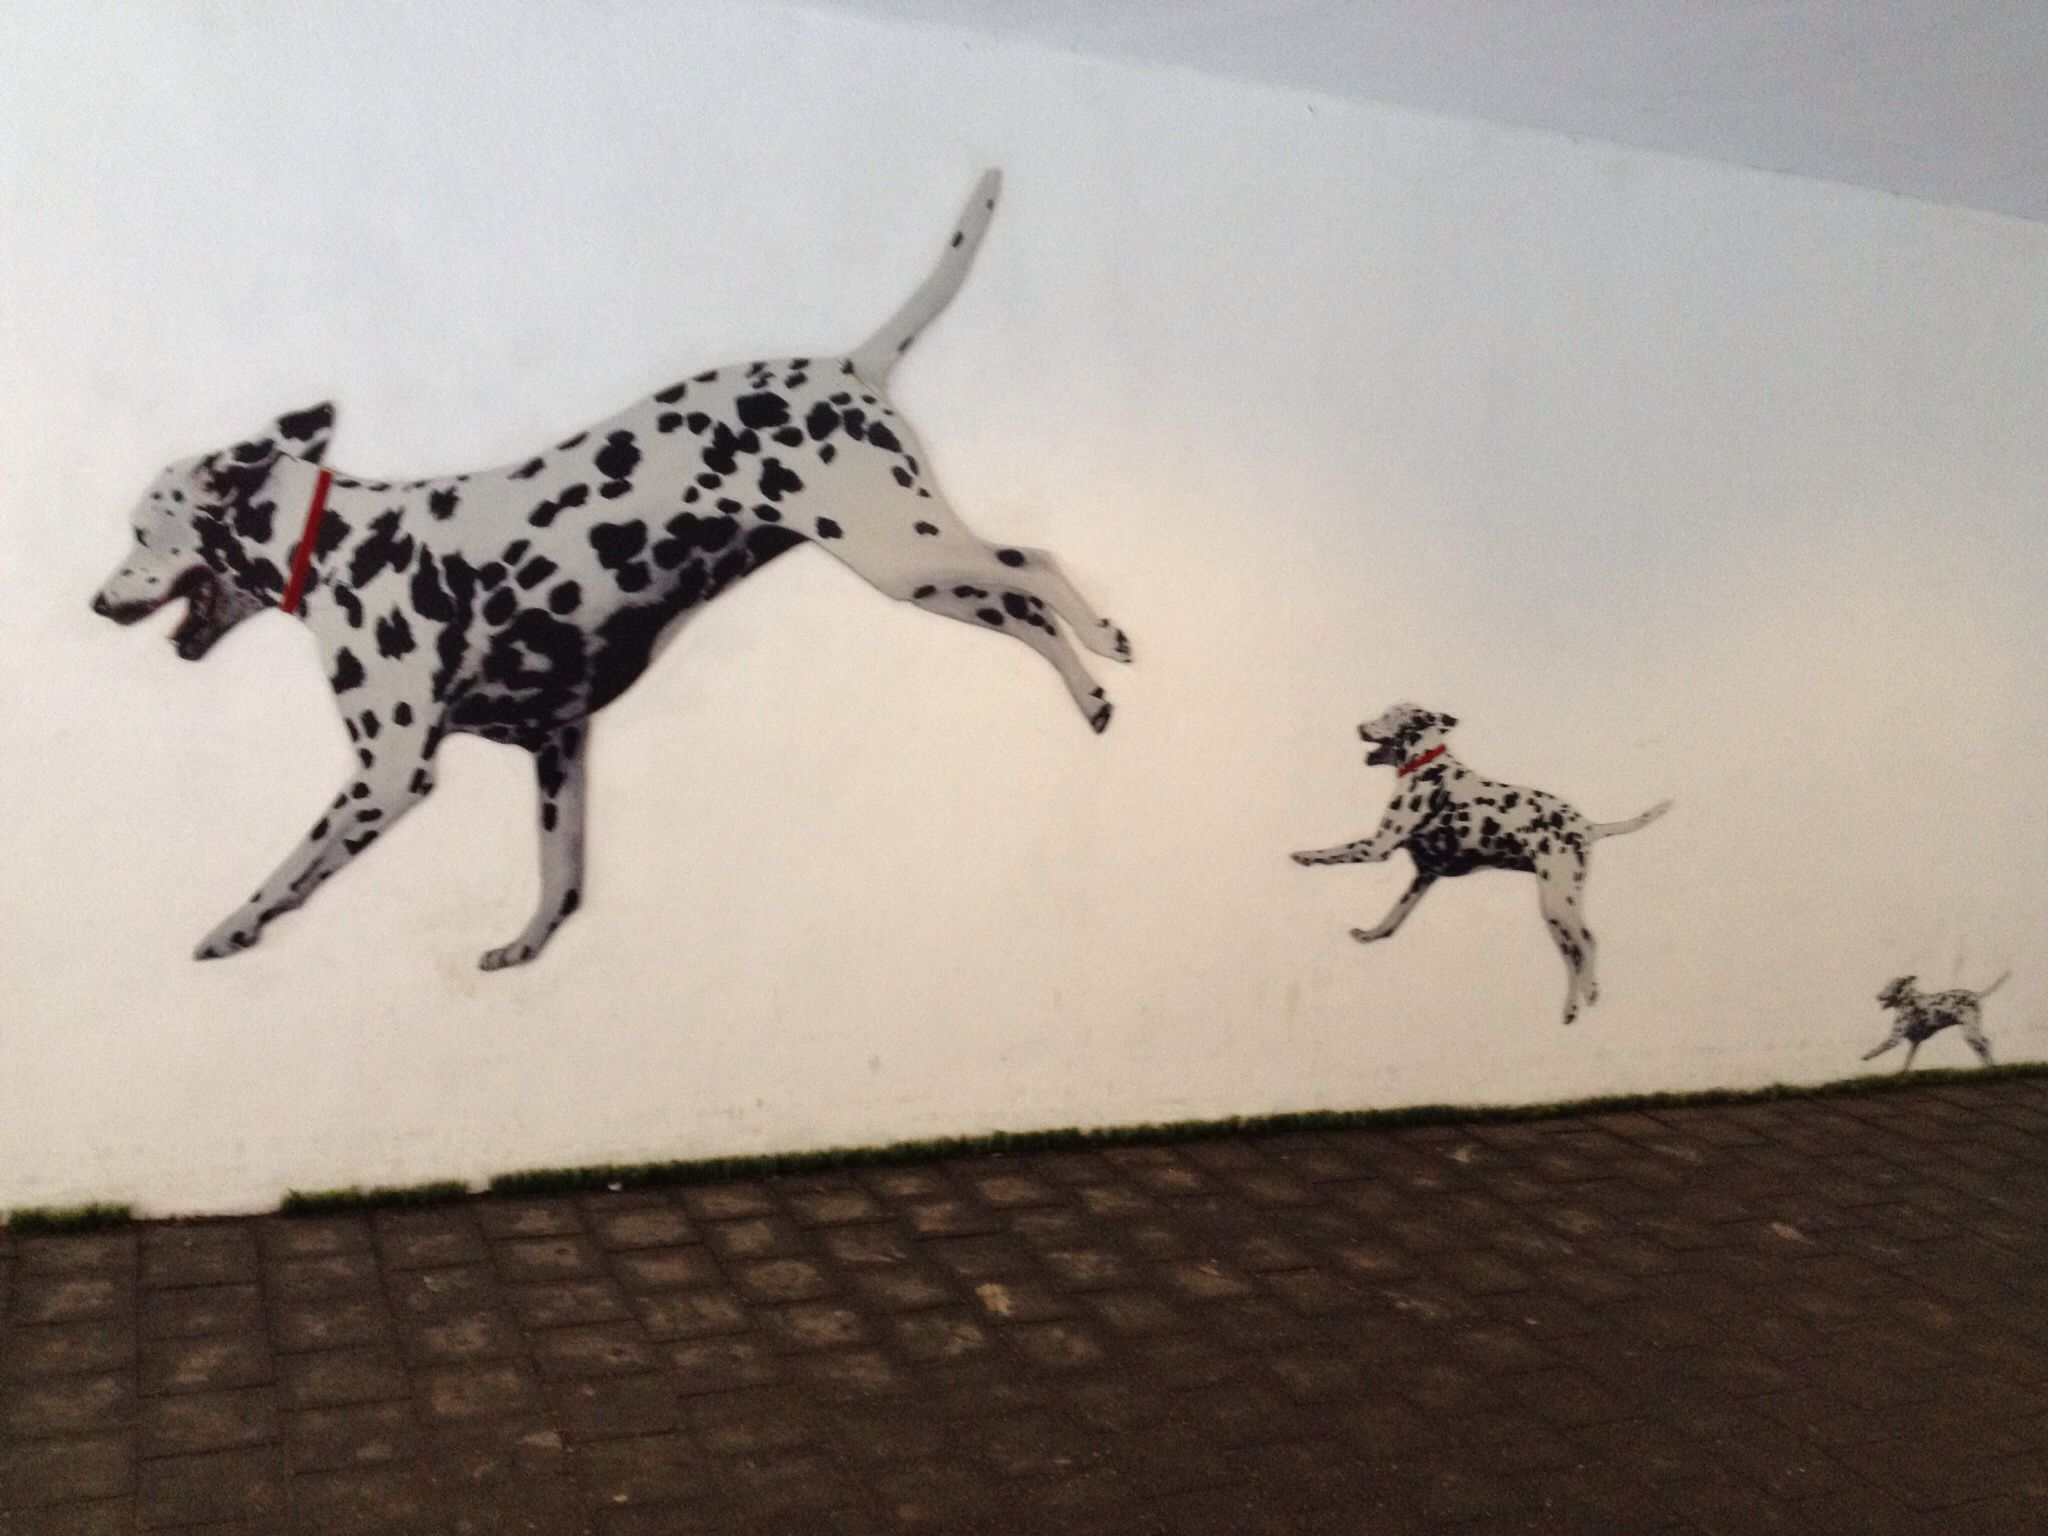 Jumping Dalmatians